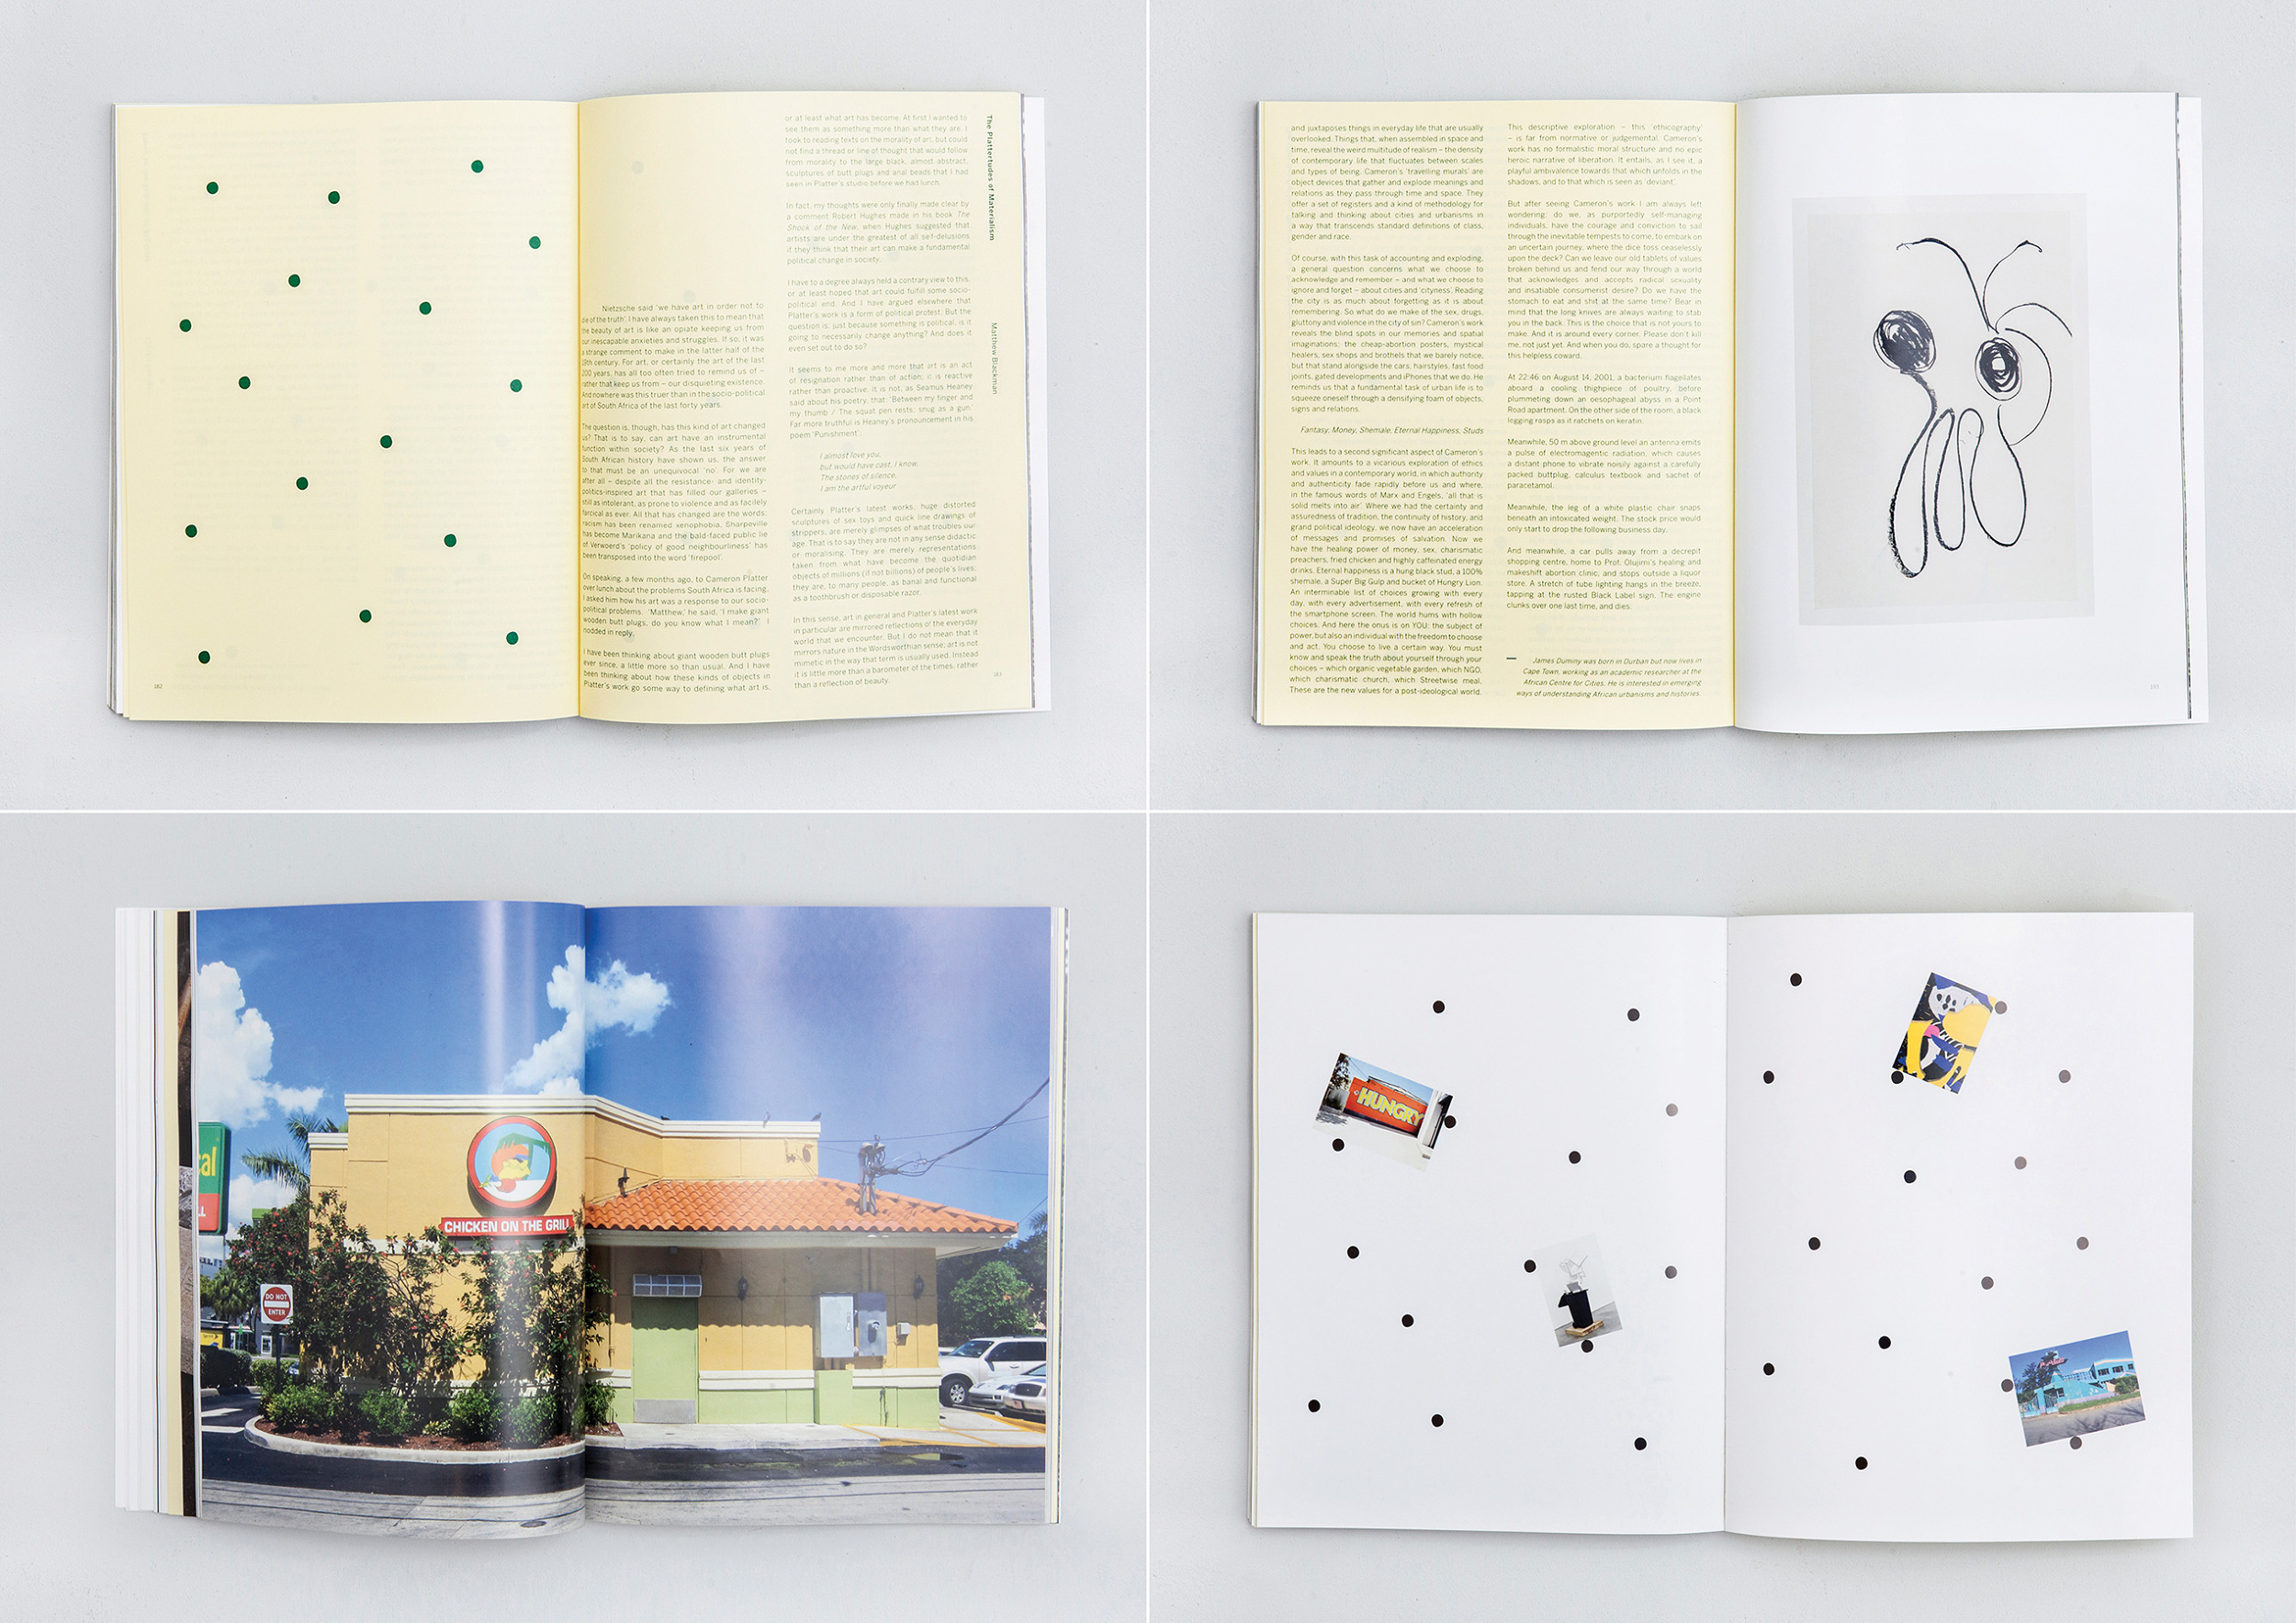 CAMERON PLATTER / I SAW THIS - BOOK - BEN JOHNSON